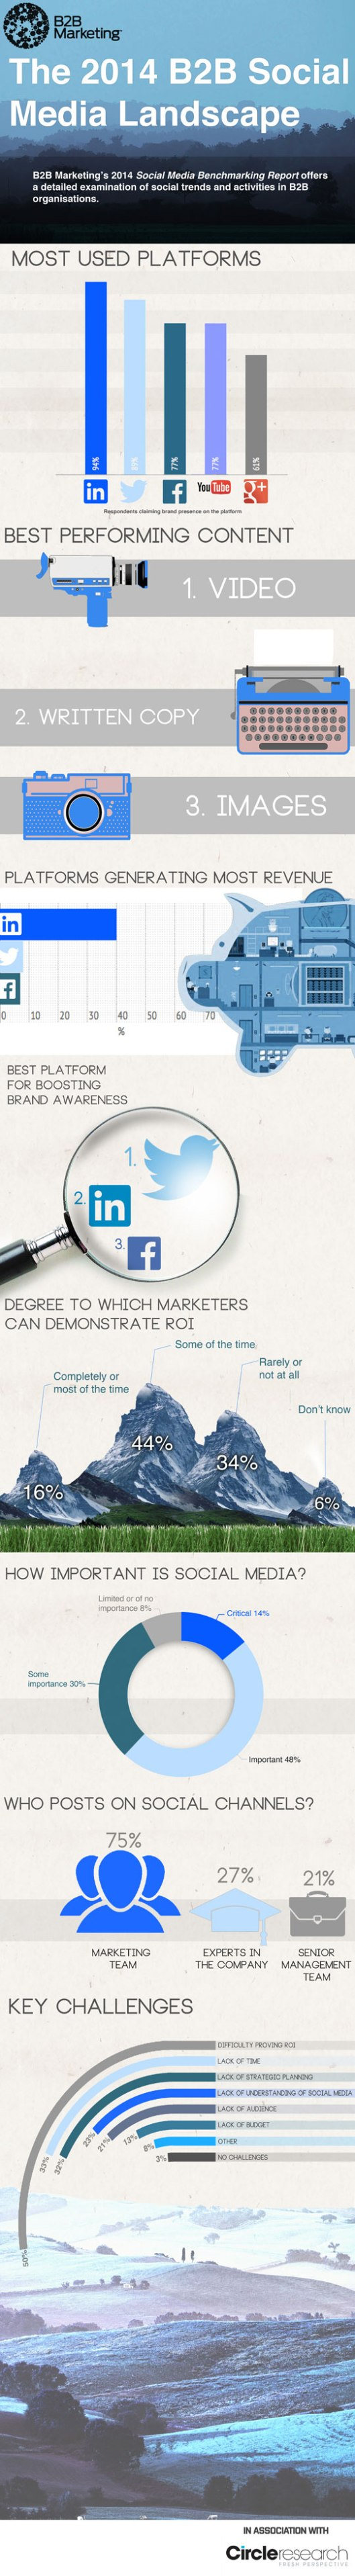 2014_B2_B_social_media_landscape_infographic_b2b